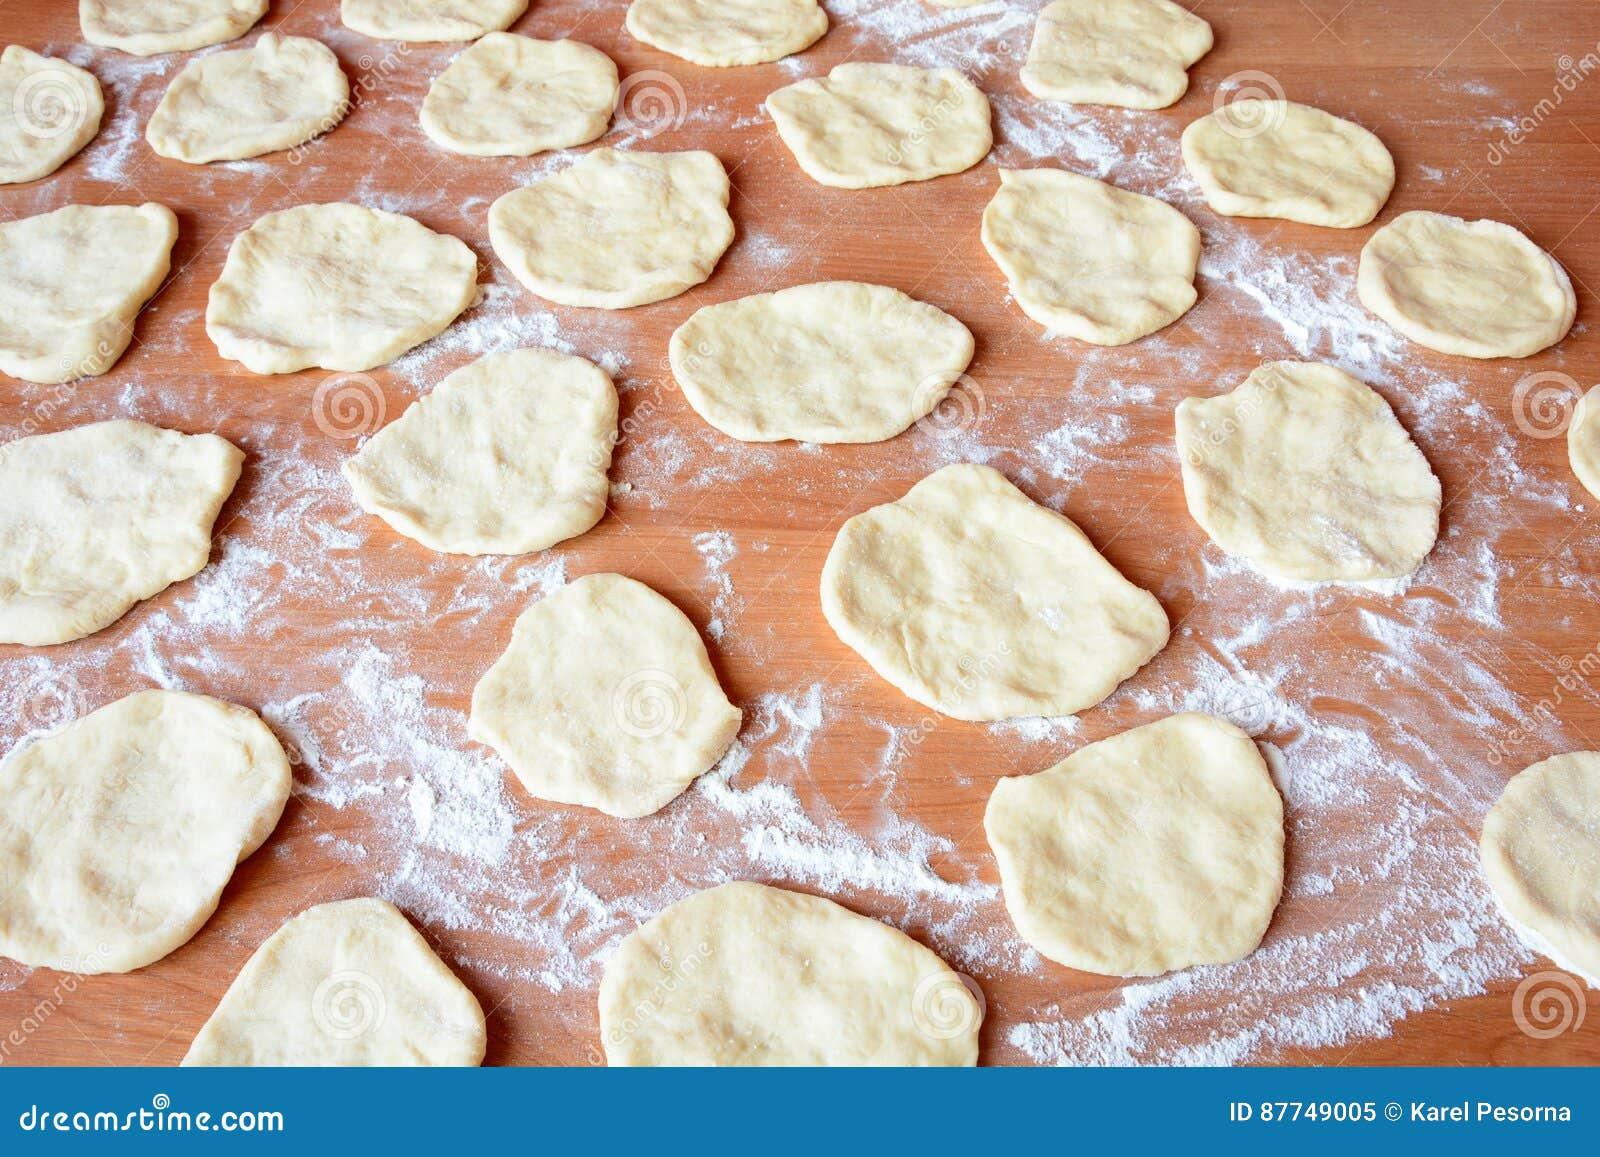 Yeast Dough Patties - Favorite Rural Delicacy 76